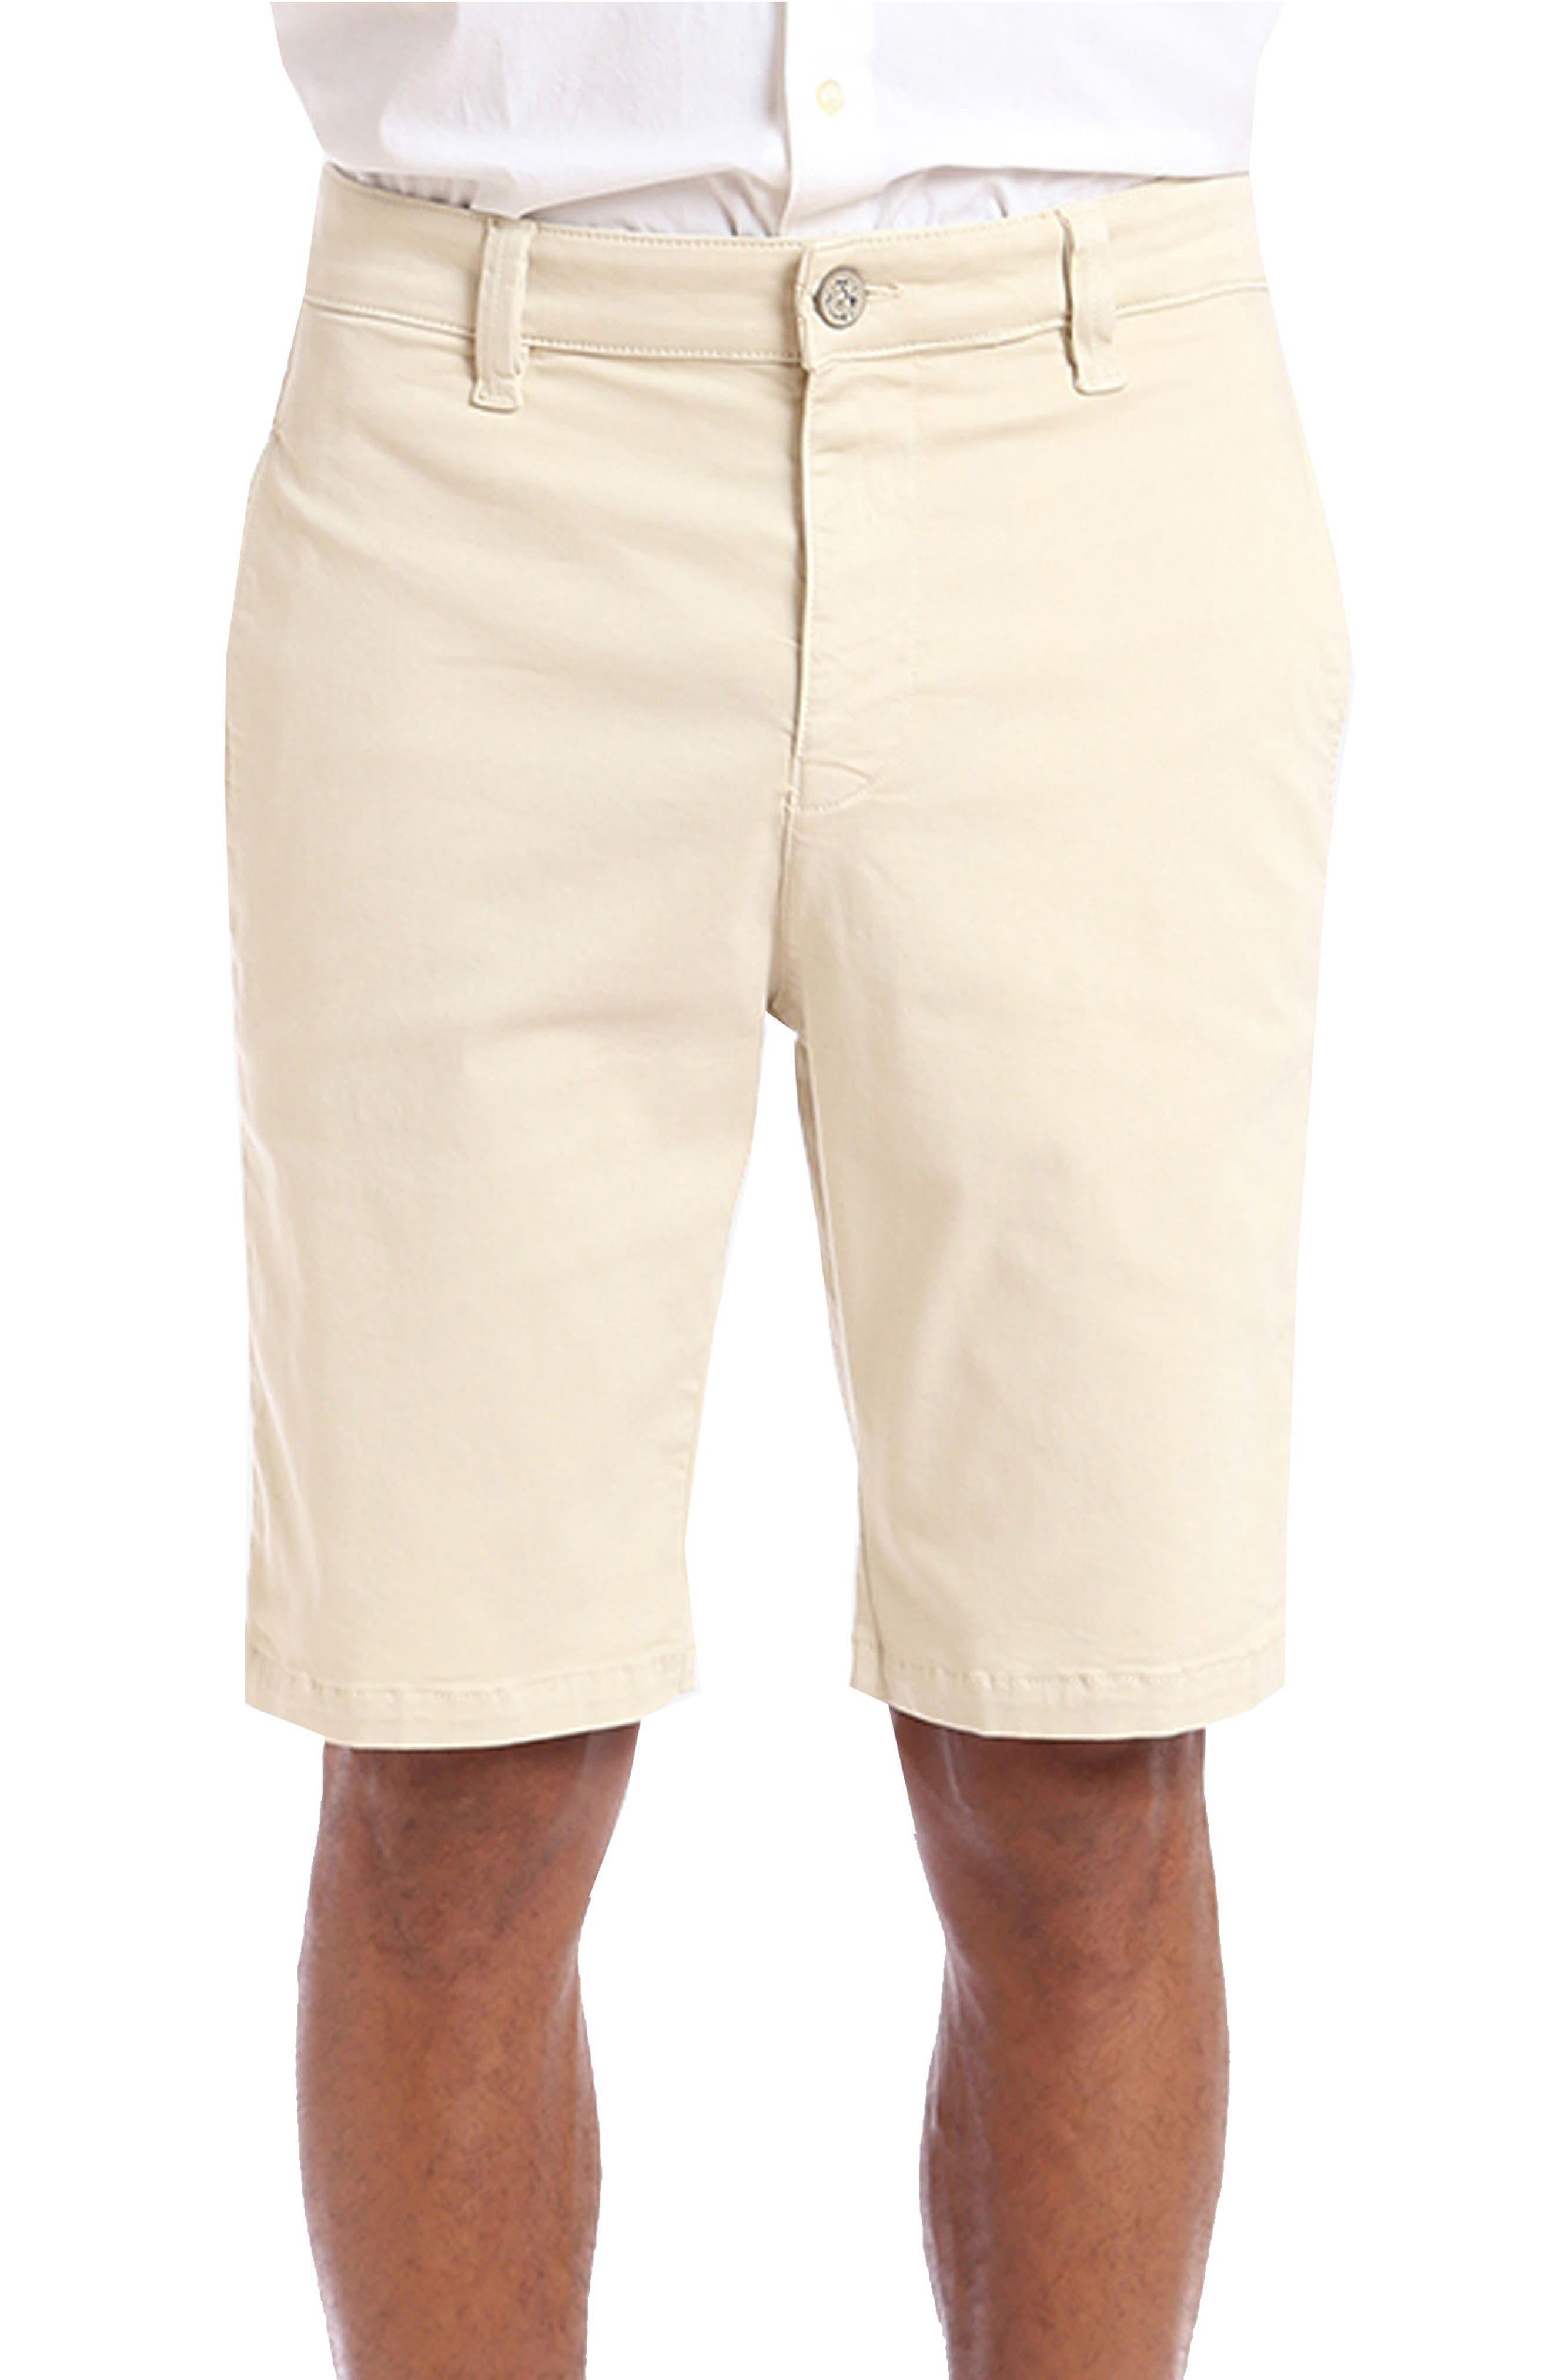 Nevada Twill Shorts,                         Main,                         color, Bone Twill